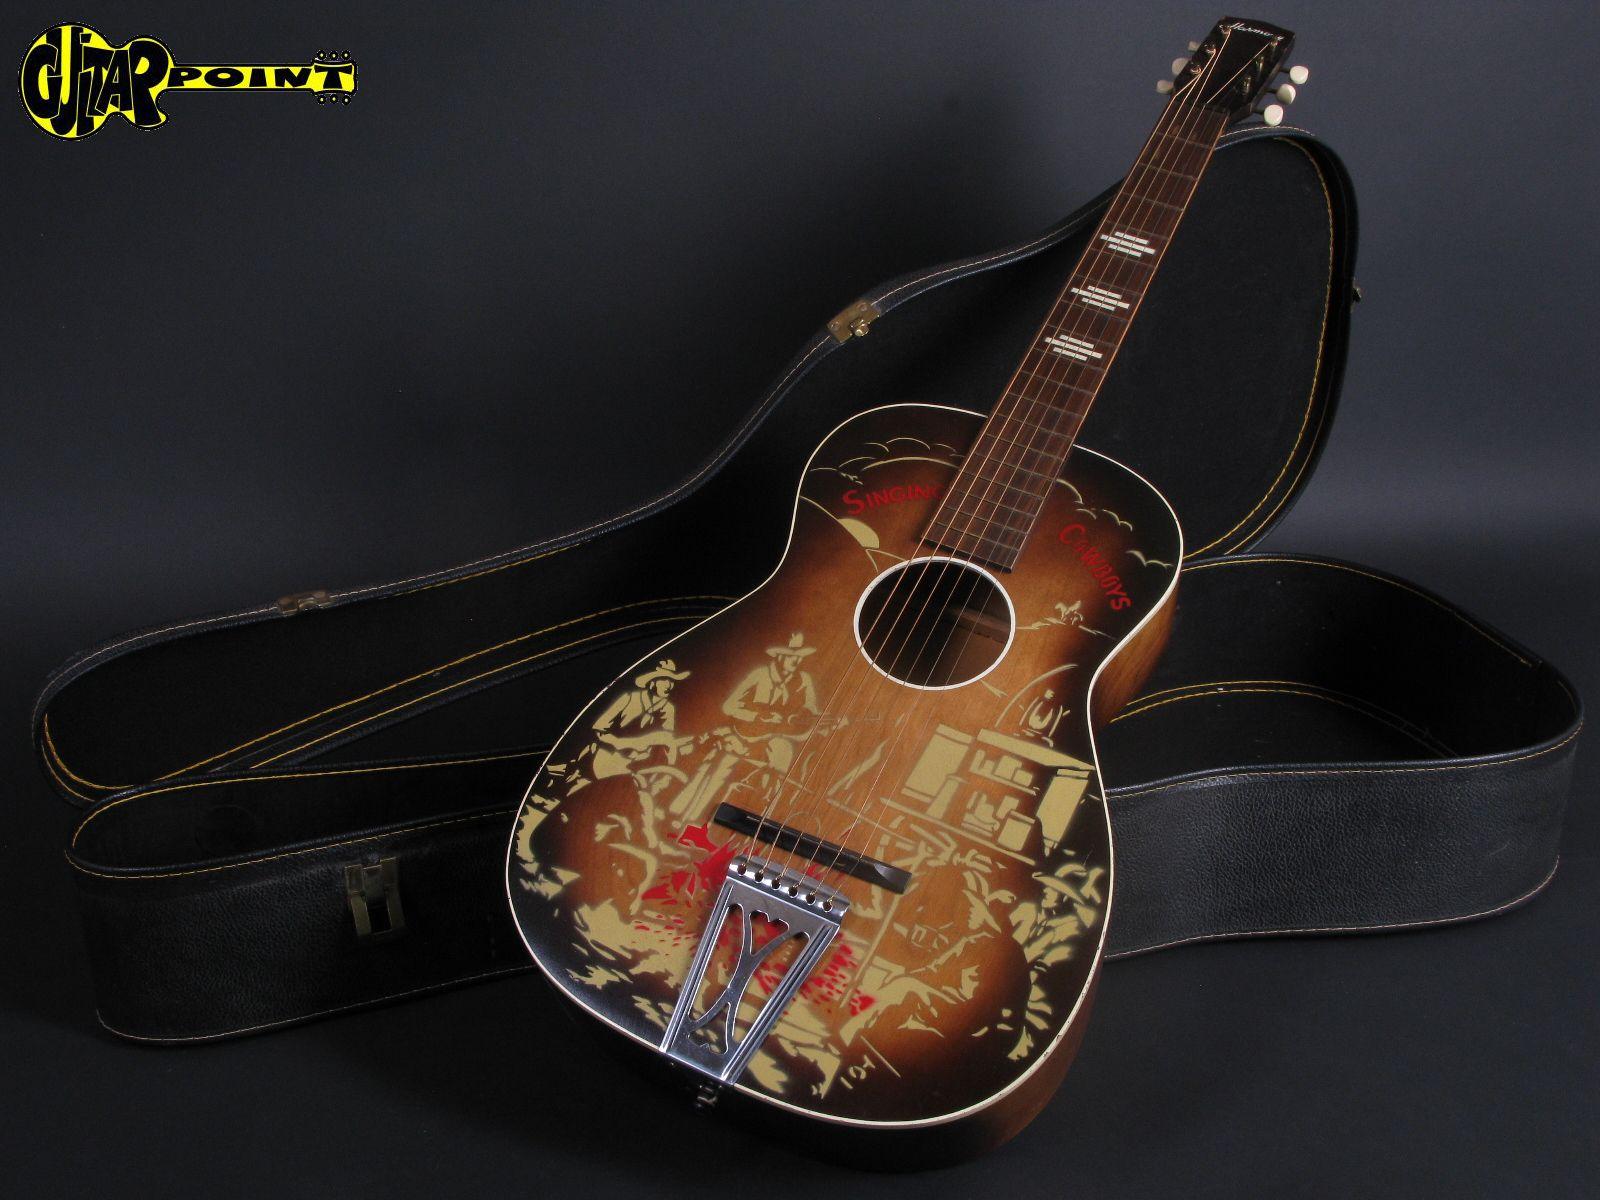 https://guitarpoint.de/app/uploads/products/1950-harmony-h1057-singing-cowboys/Harmony50SingCowboy_16.jpg